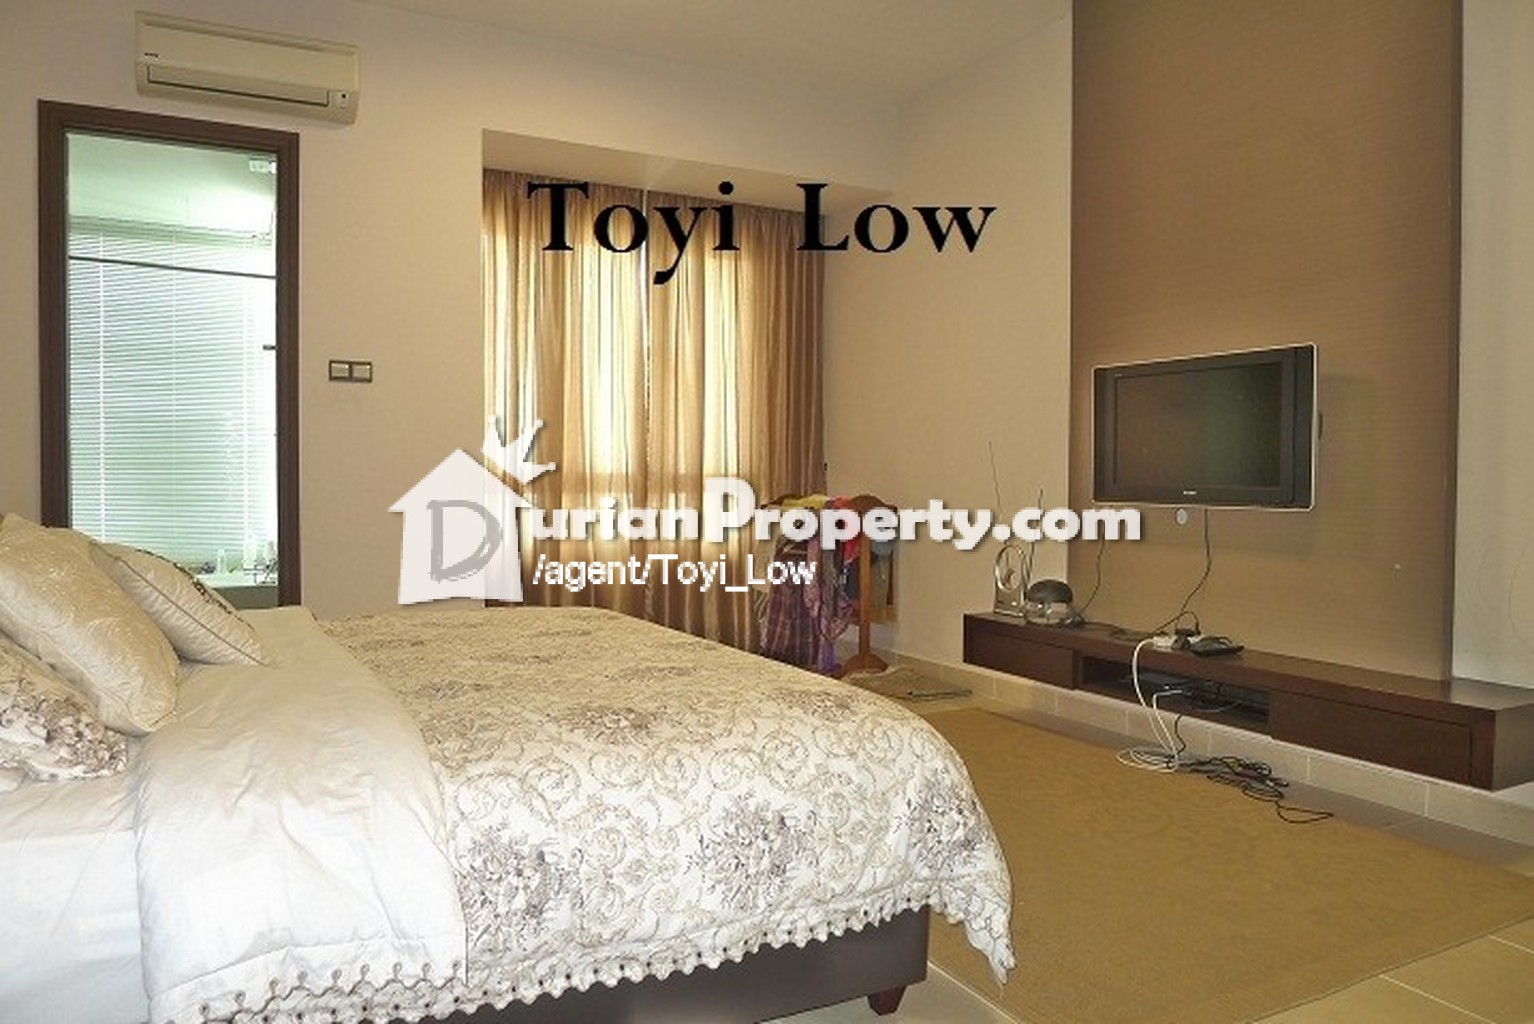 Condo Duplex For Sale At Riana Green East Wangsa Maju For